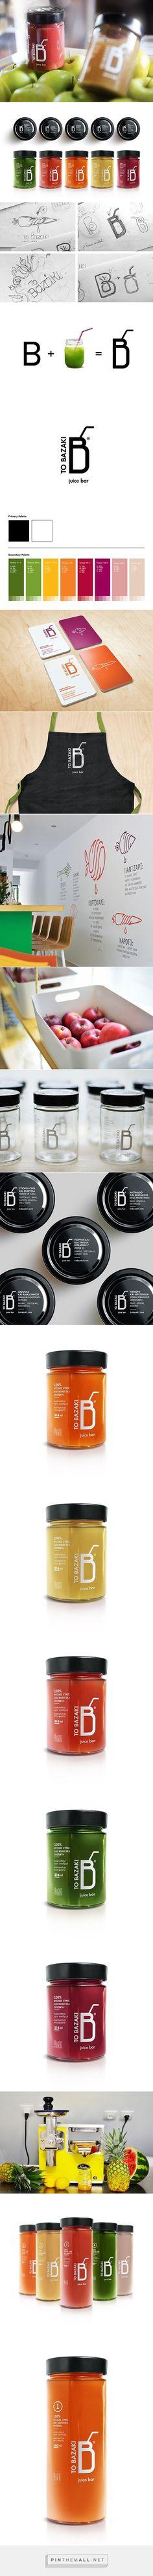 """TO BAZAKI"" Juice Bar – Design Identity. Designed by George Probonas. #Arts Design"